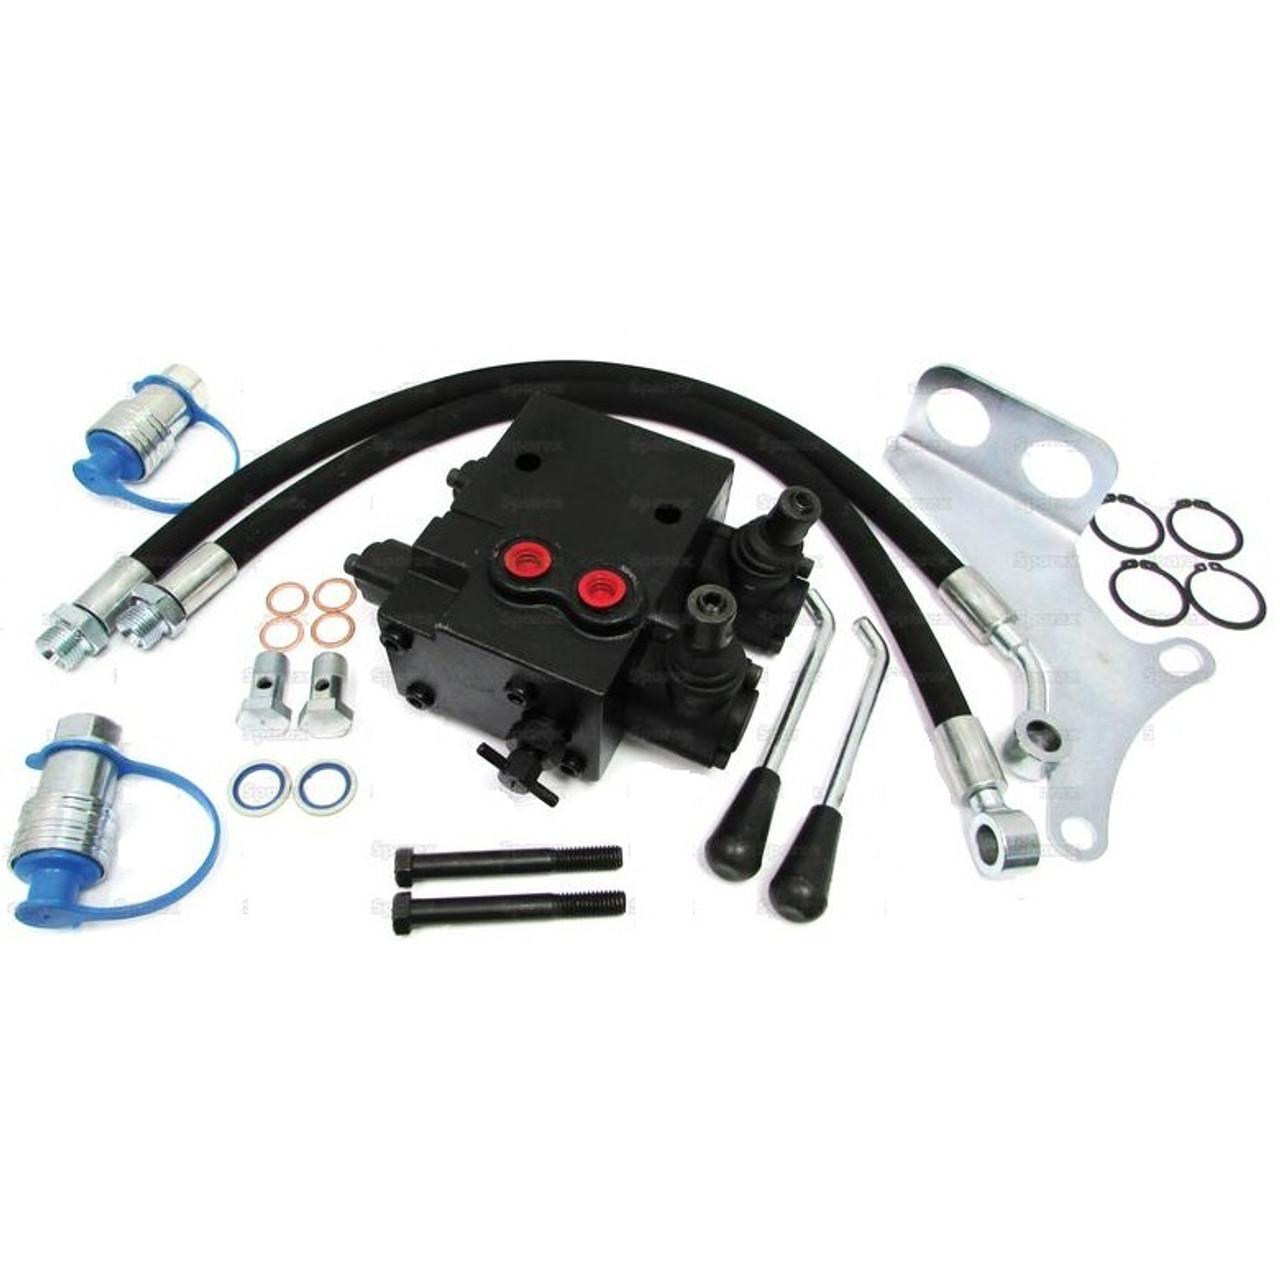 Hydraulic Remote Valve Kit